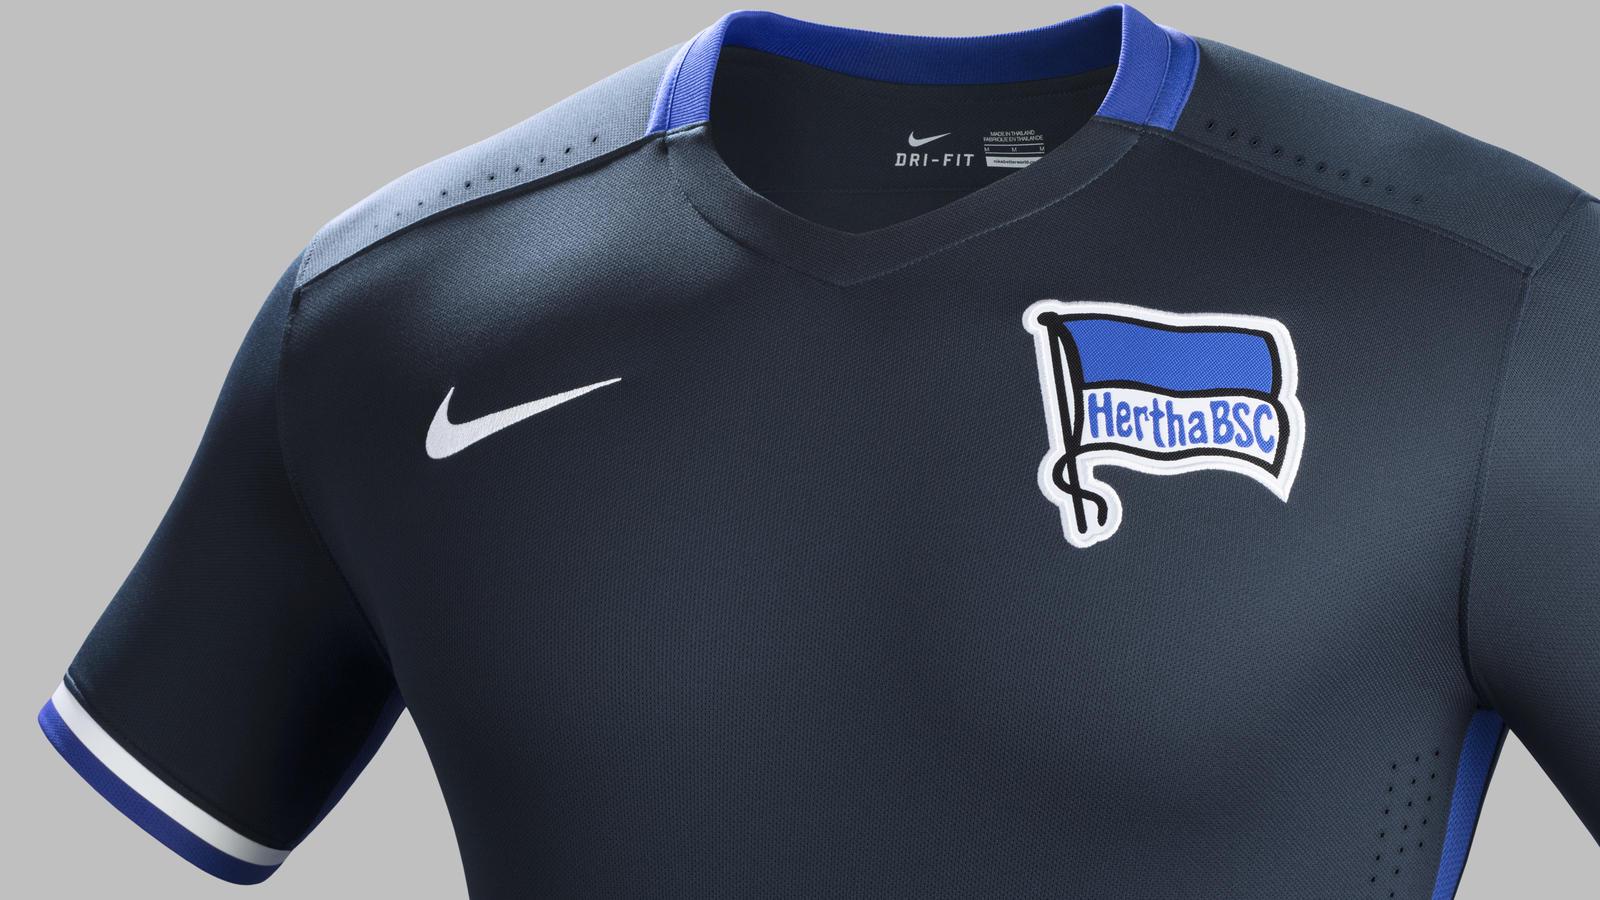 fcd6cef131 Berlin Pride Inspires Hertha BSC 2015-16 Home and Away Kits - Nike News